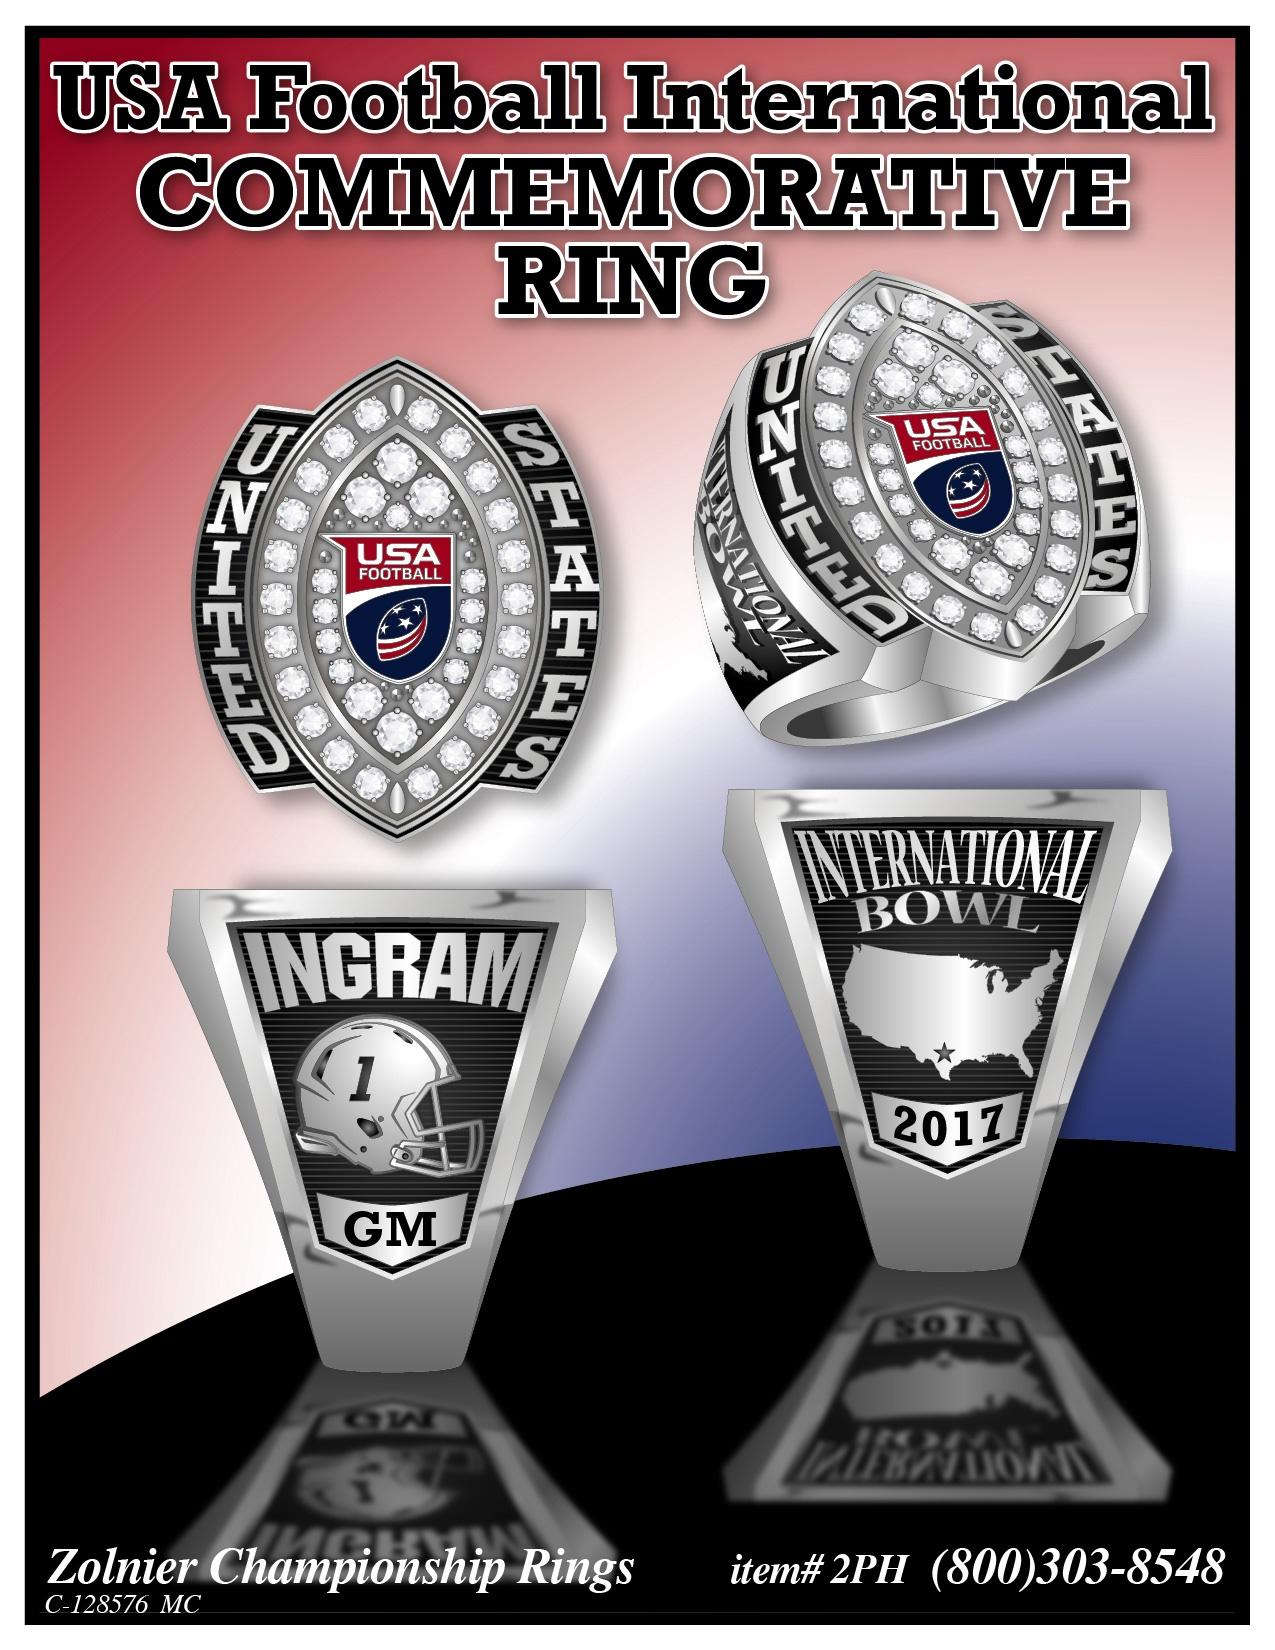 C-128576 USA Football International Commemorative Ring